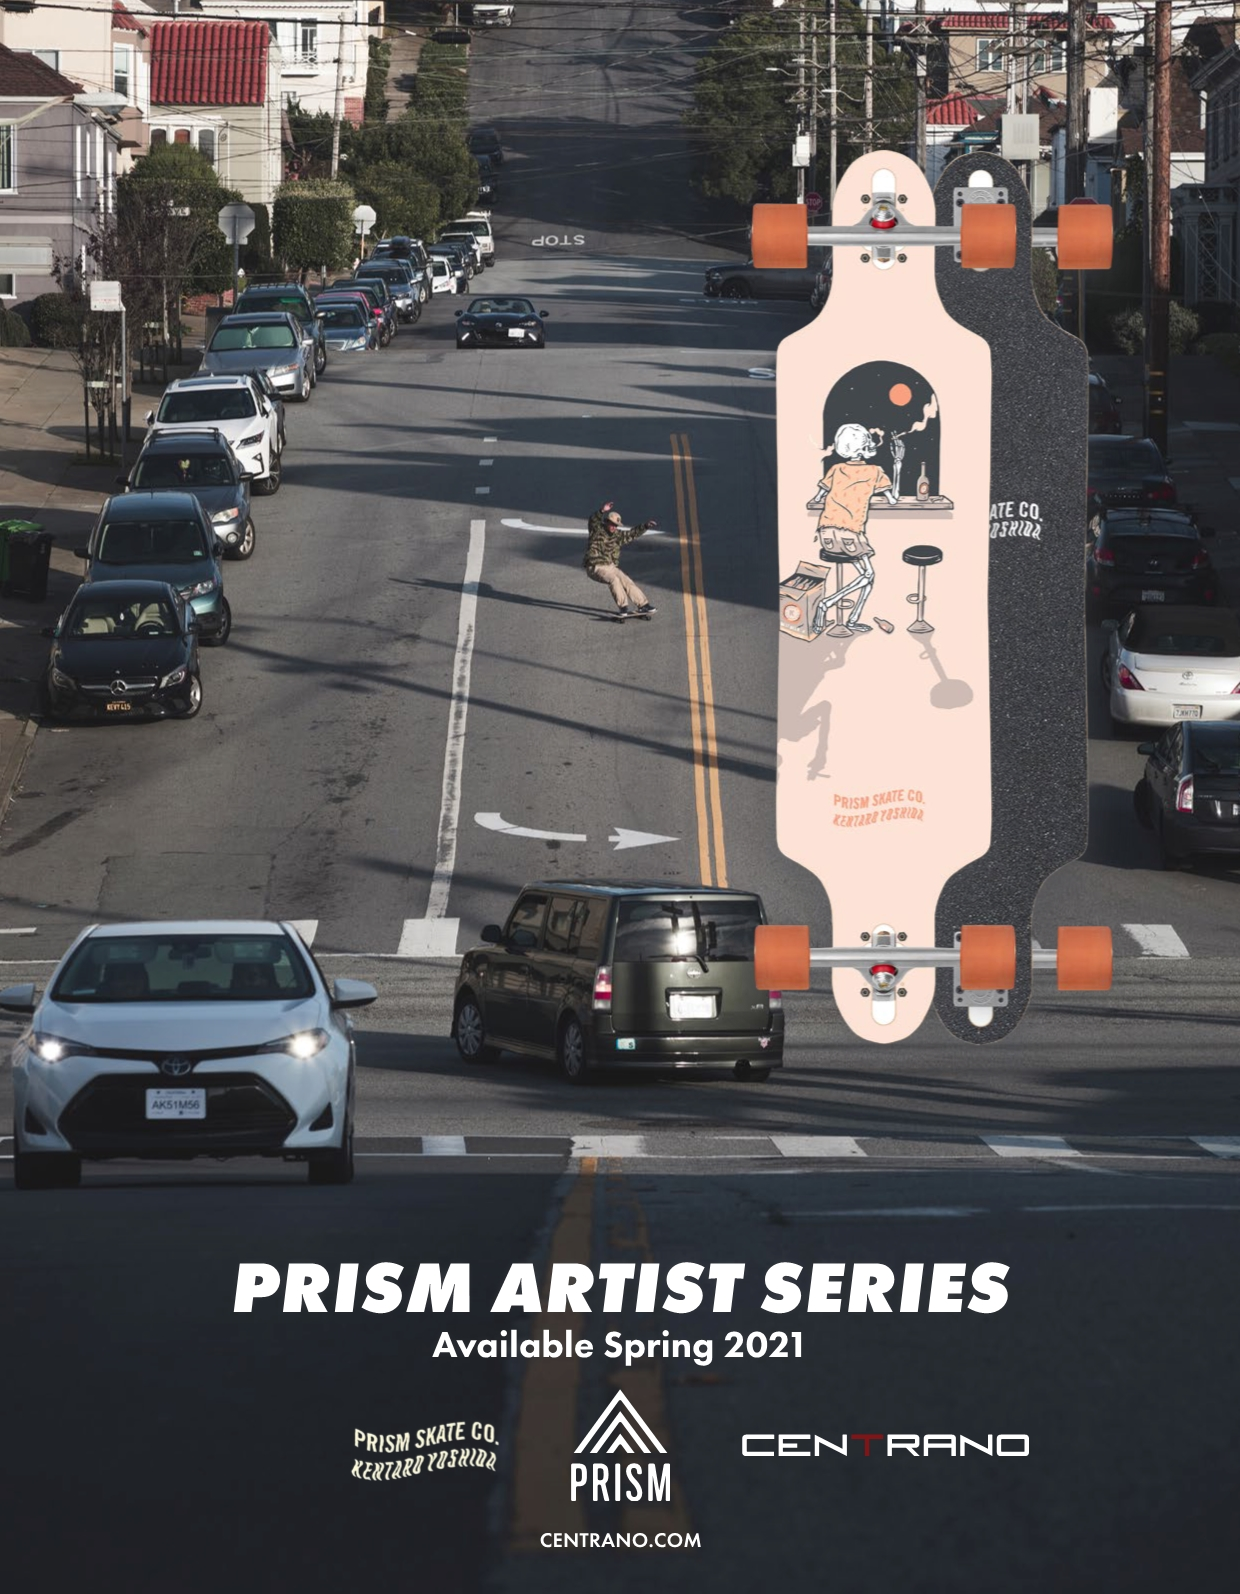 105 prism cruisers